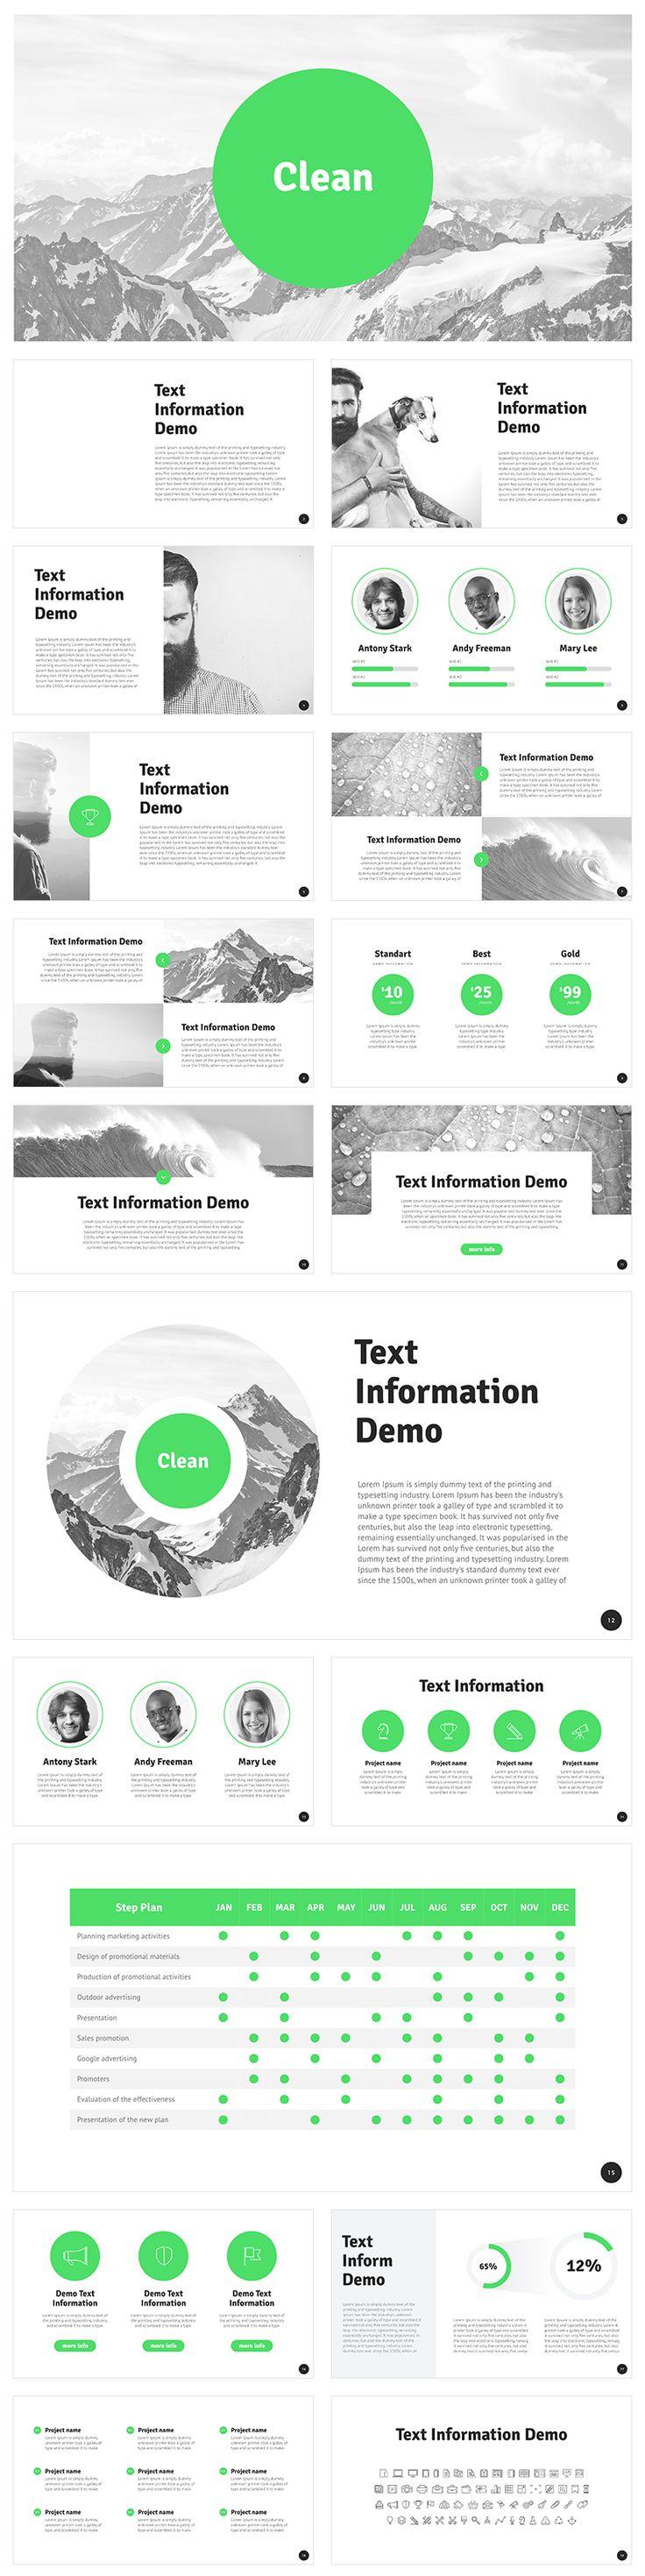 New Free Template for #Keynote https://goo.gl/cYKqV3 Professional design, clean and modern, 18 Unique slides, 16:9 HD Aspect ratio. #iwork #keynote #report #key #green #nature #modern